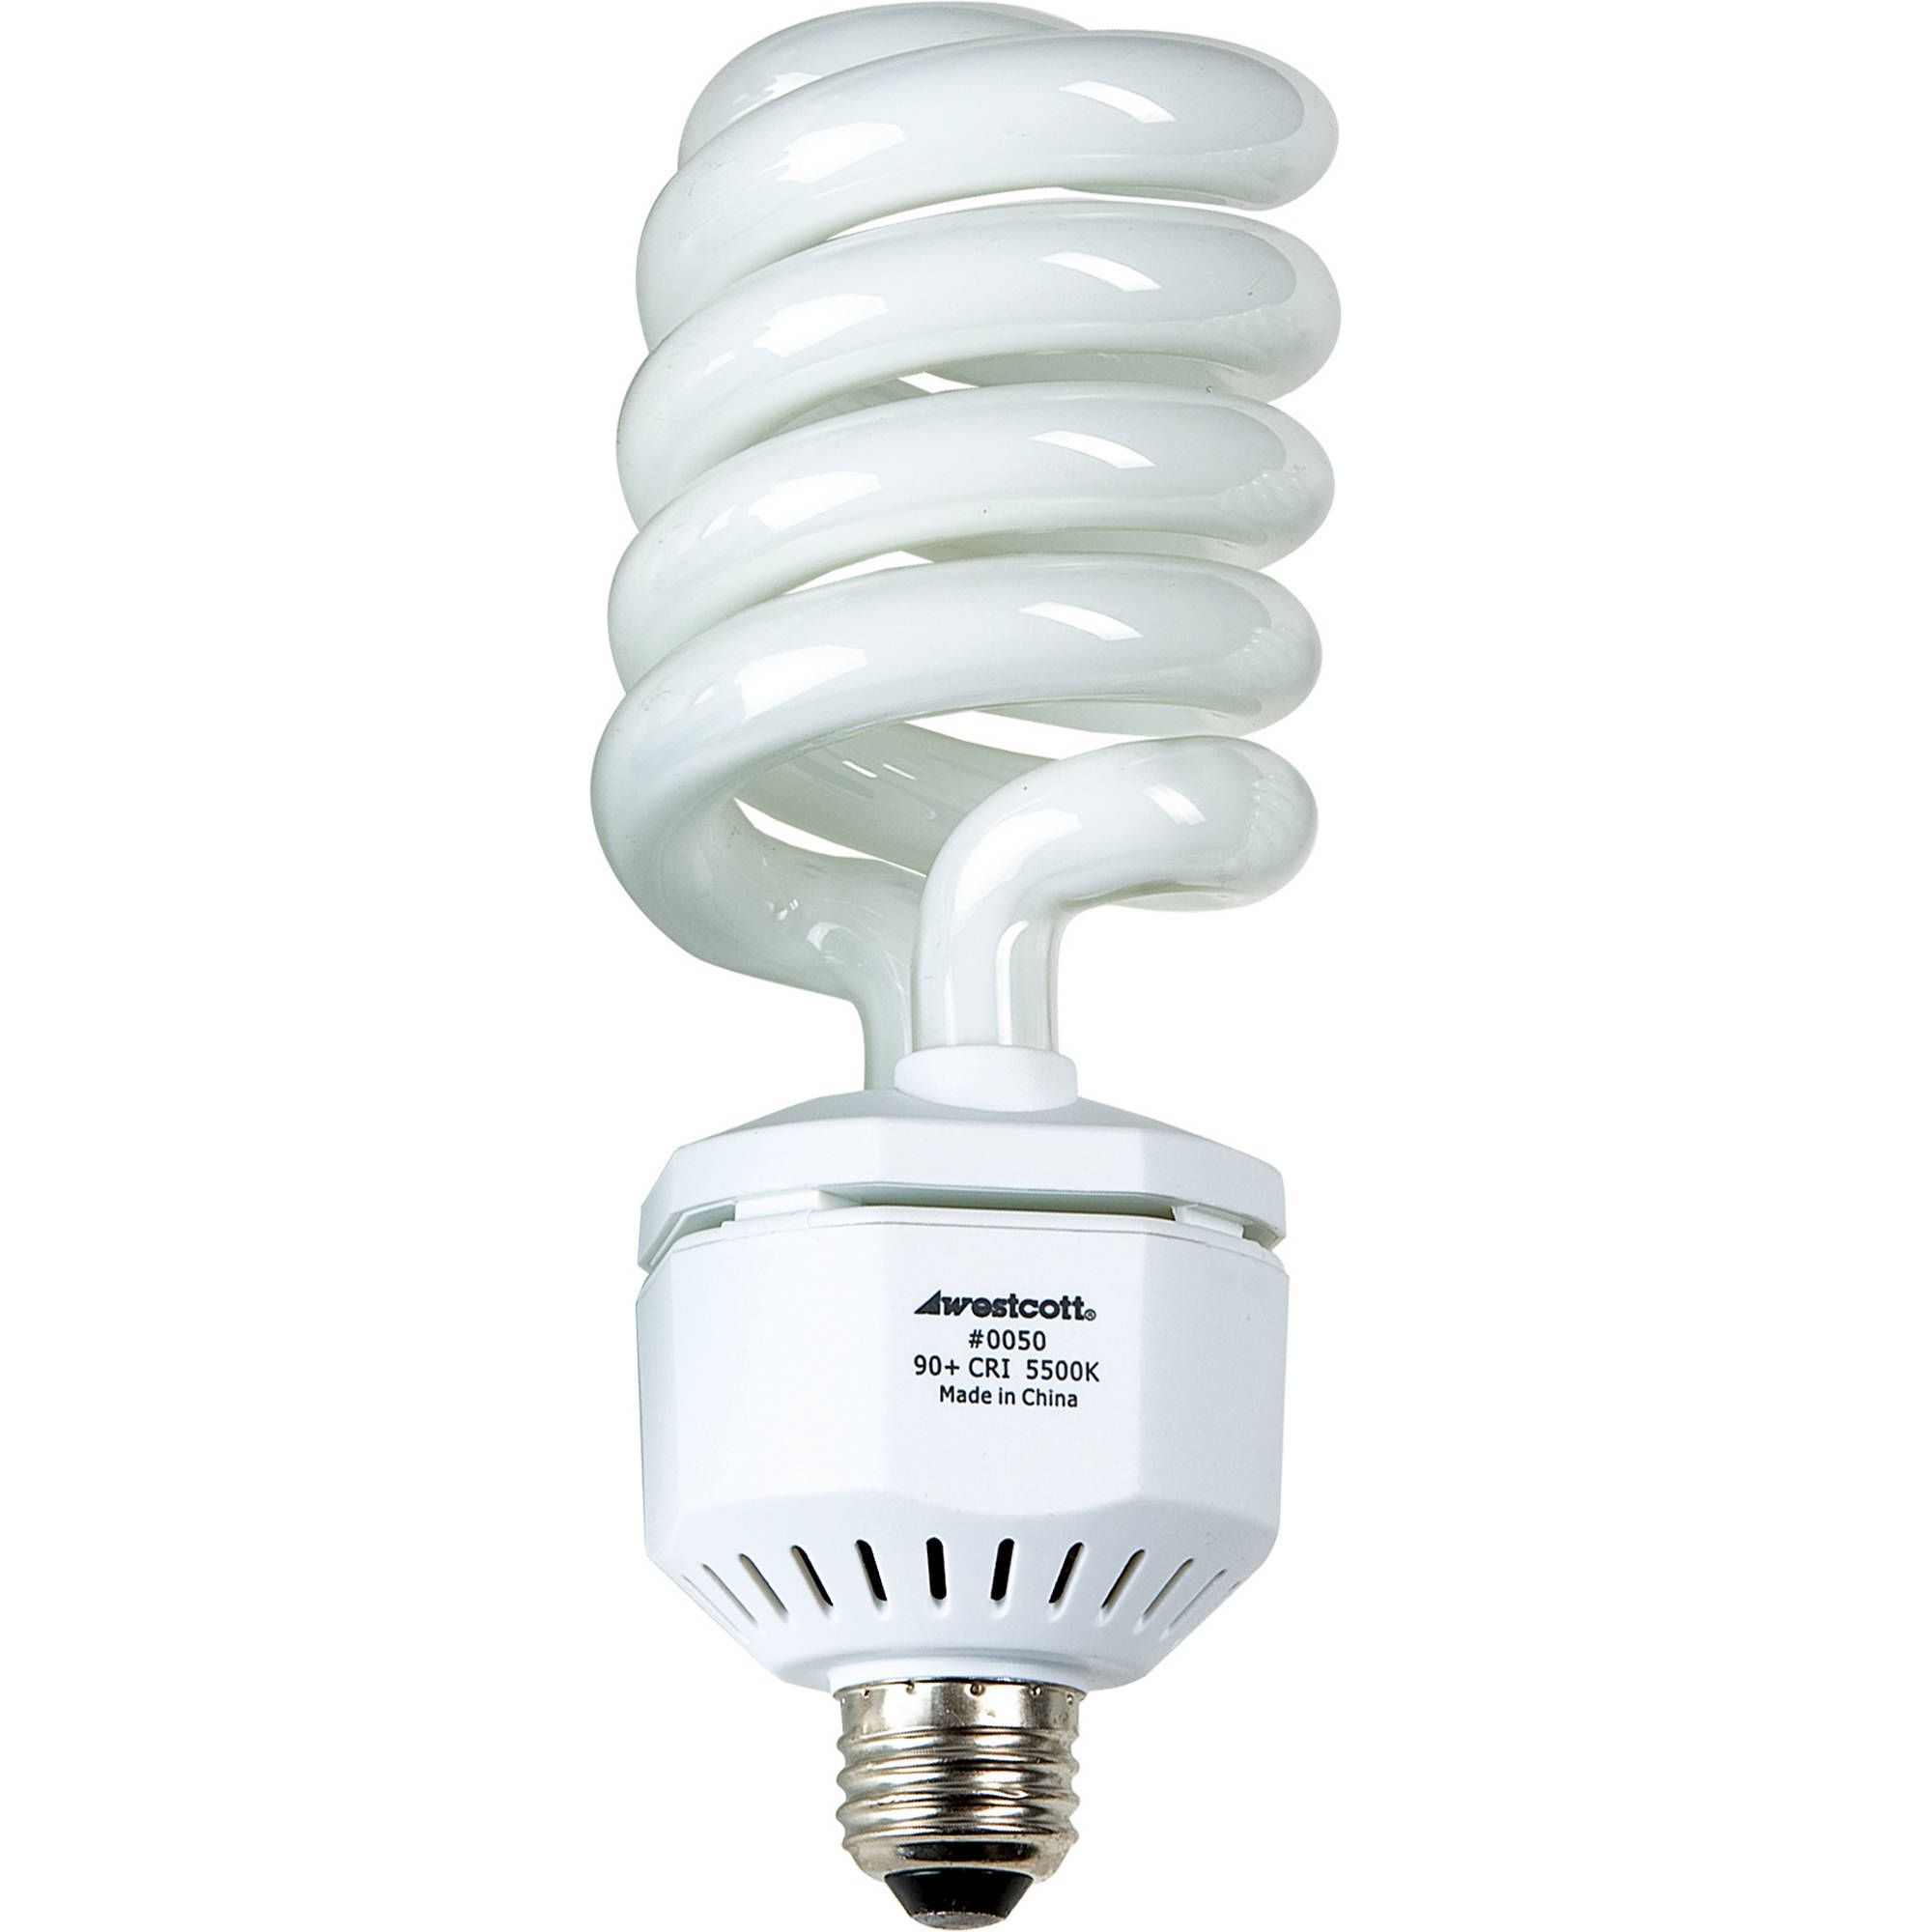 Fluorescent Light Bulbs Wattage